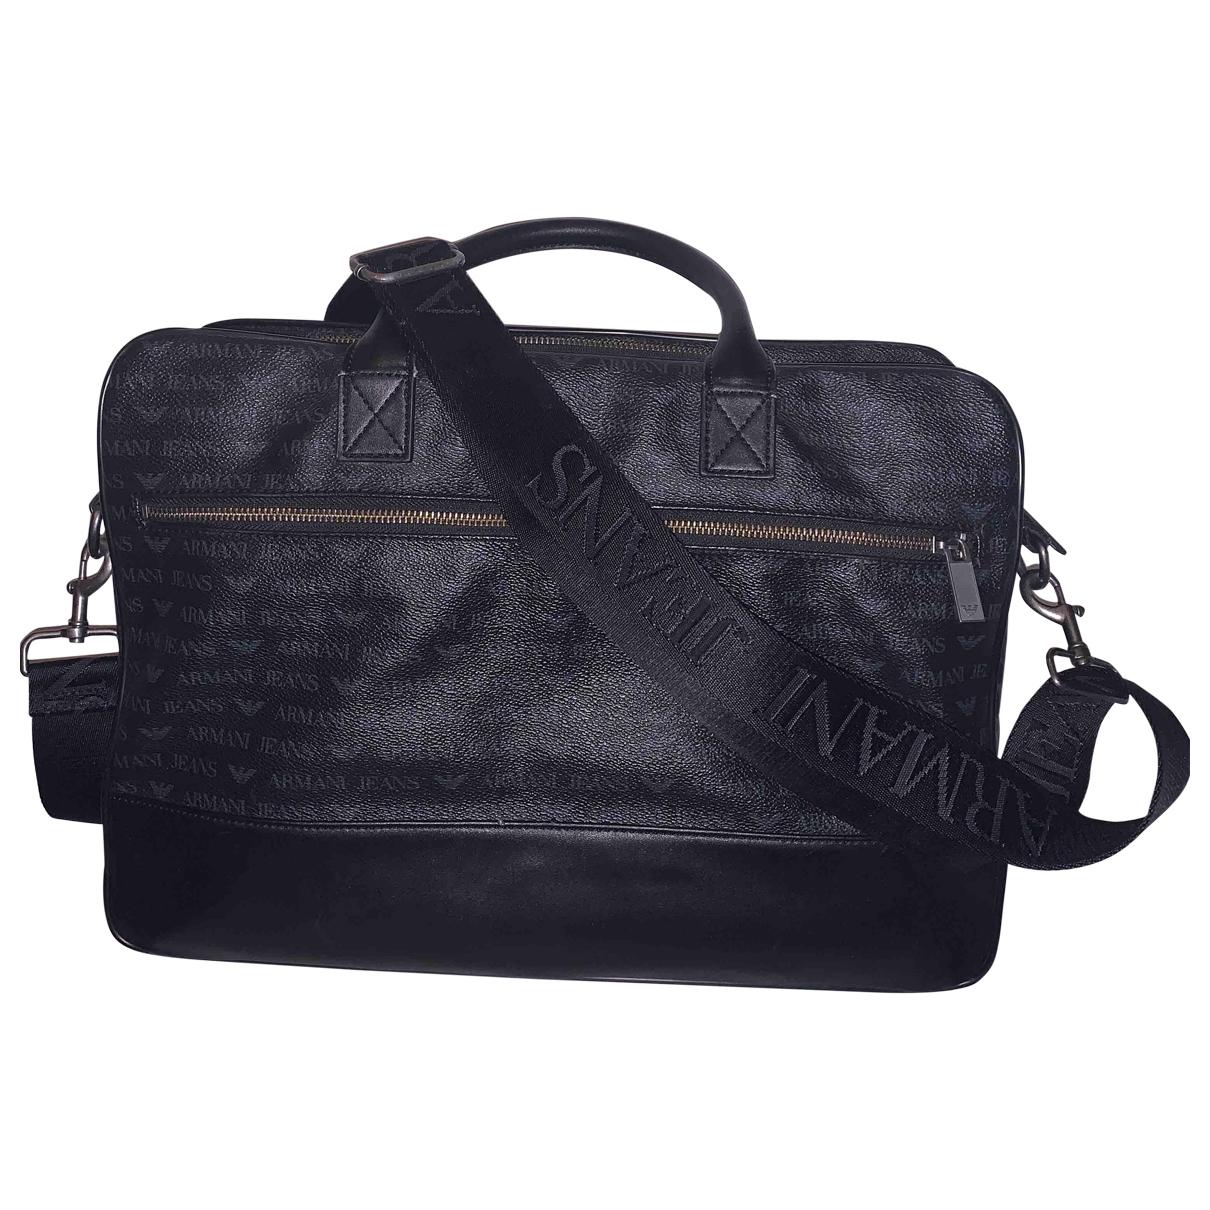 Armani Jeans \N Black Travel bag for Women \N